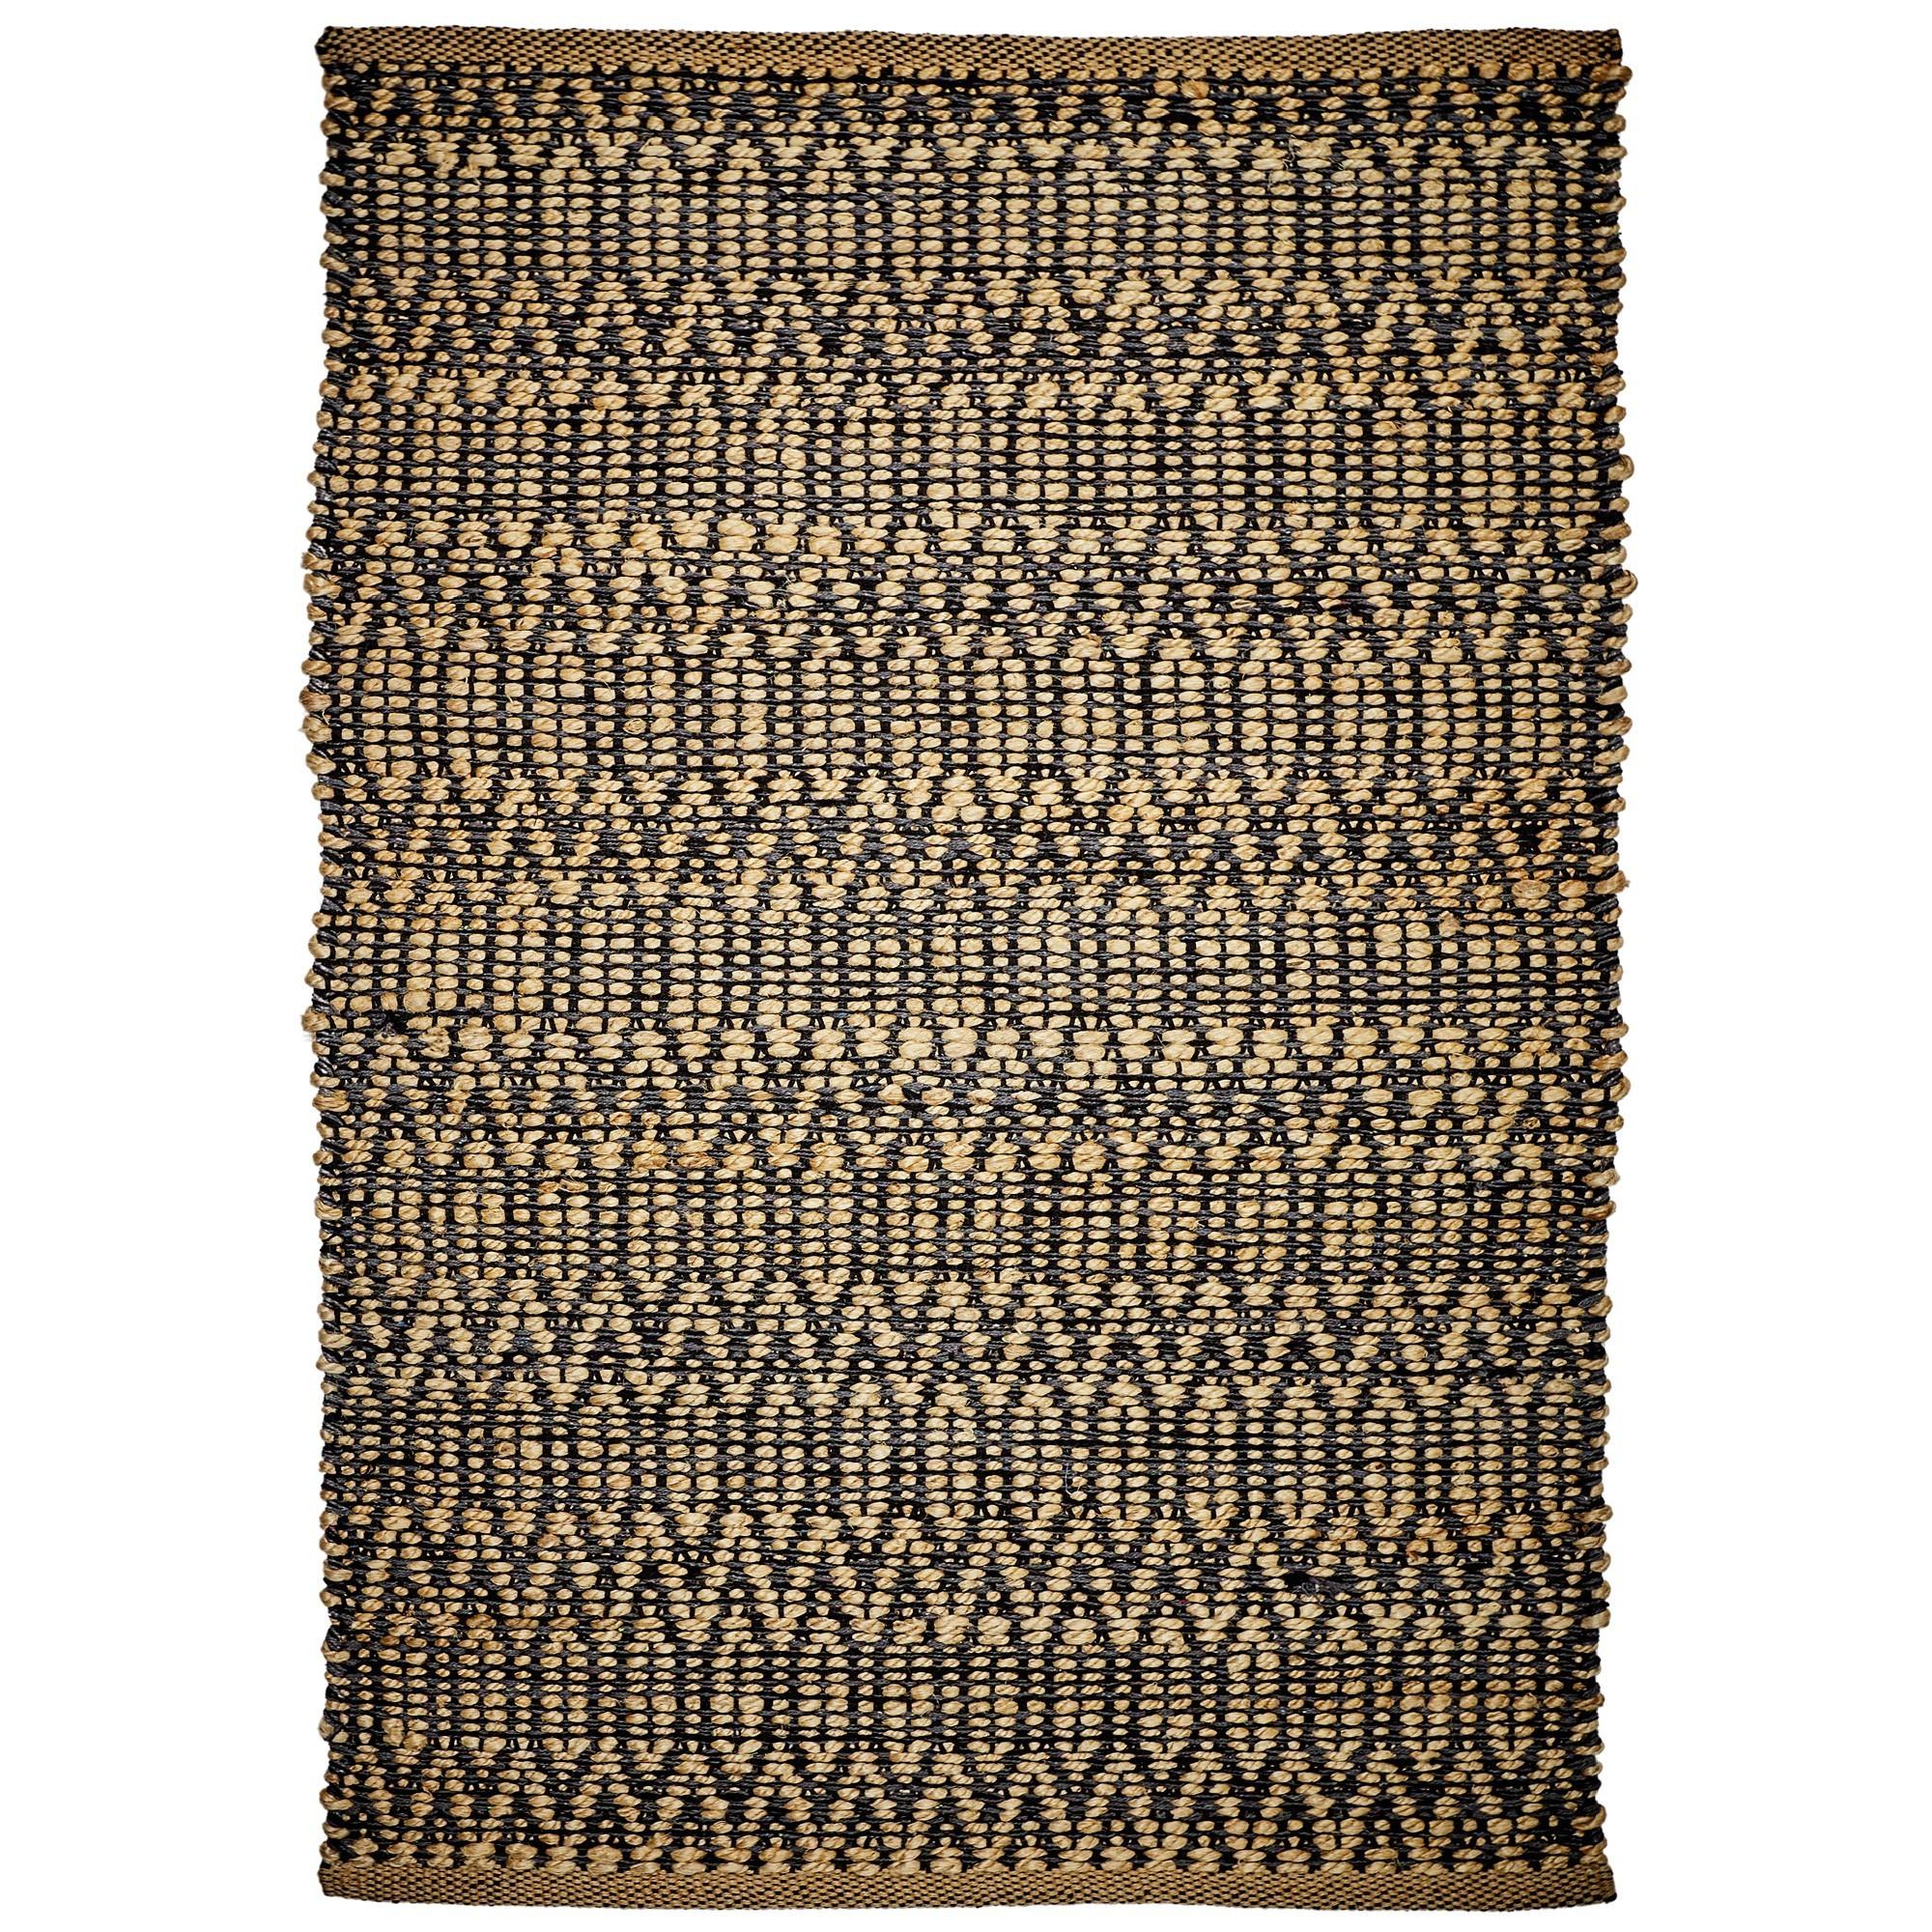 Minar Jute & Cotton Rug, 290x190cm, Black / Natural